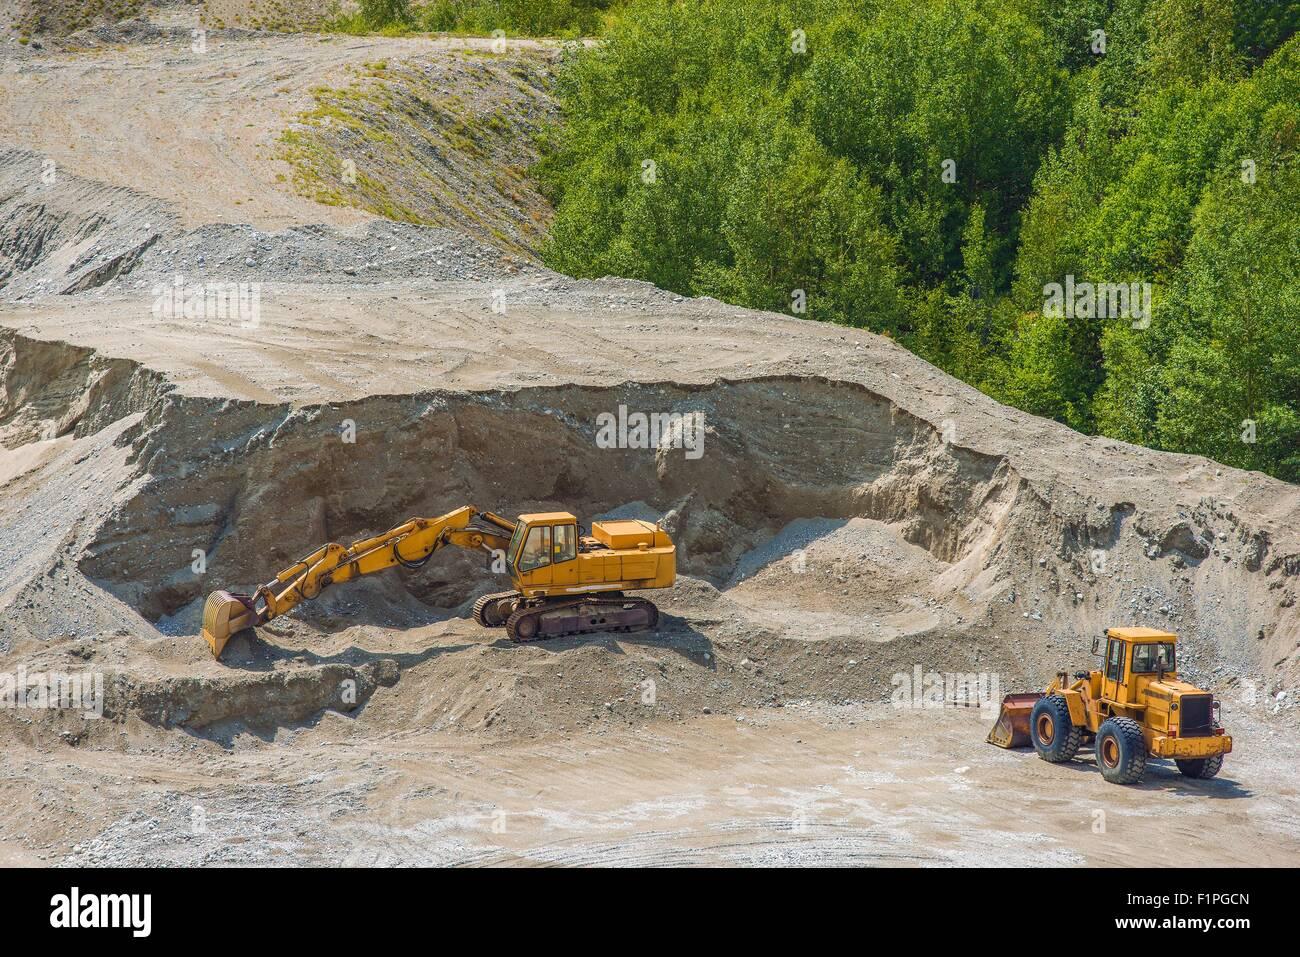 Excavation Ground Works. Excavator and Large Bulldozer Works. - Stock Image